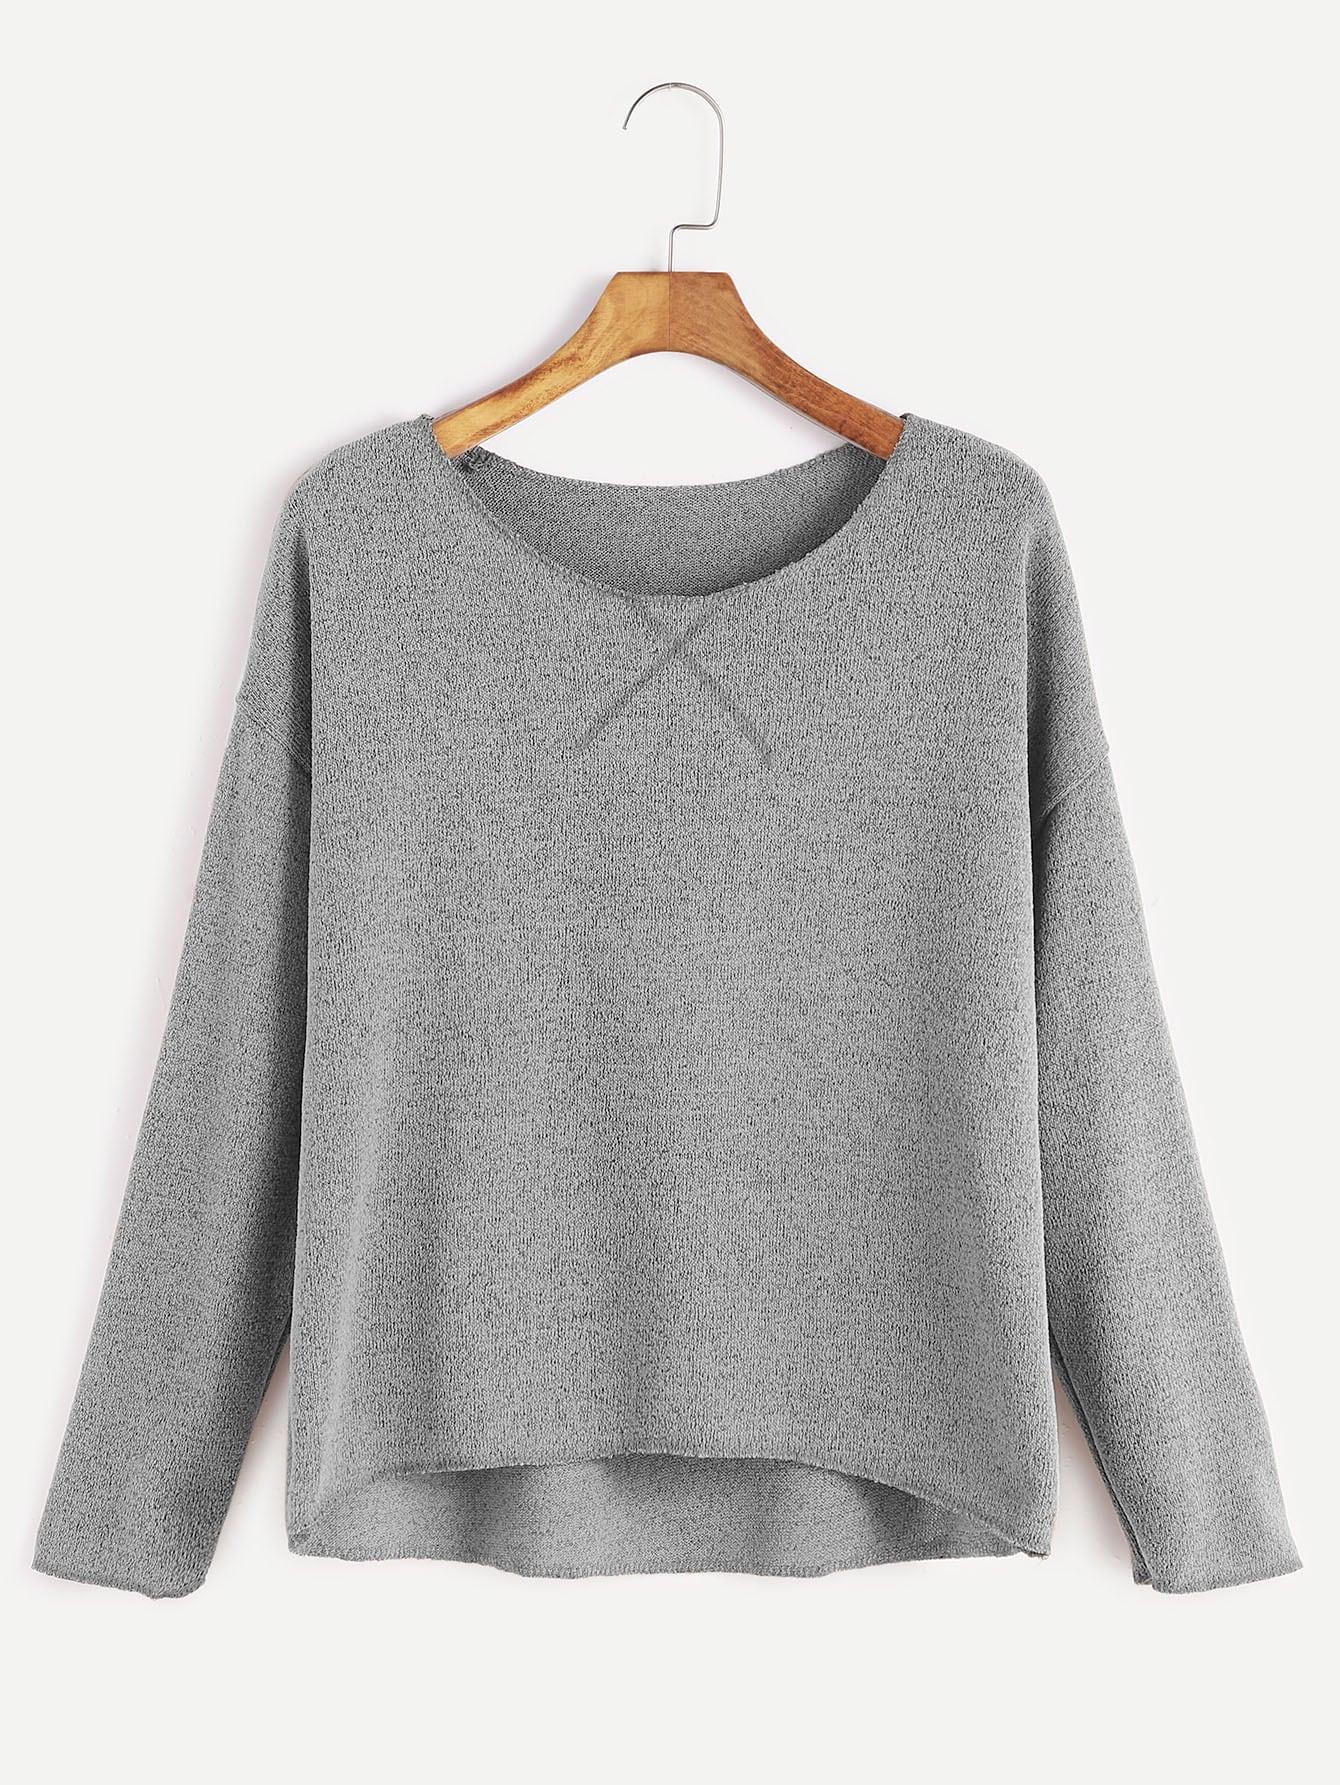 Grey Drop Shoulder Dip Hem T-shirt tee161206104